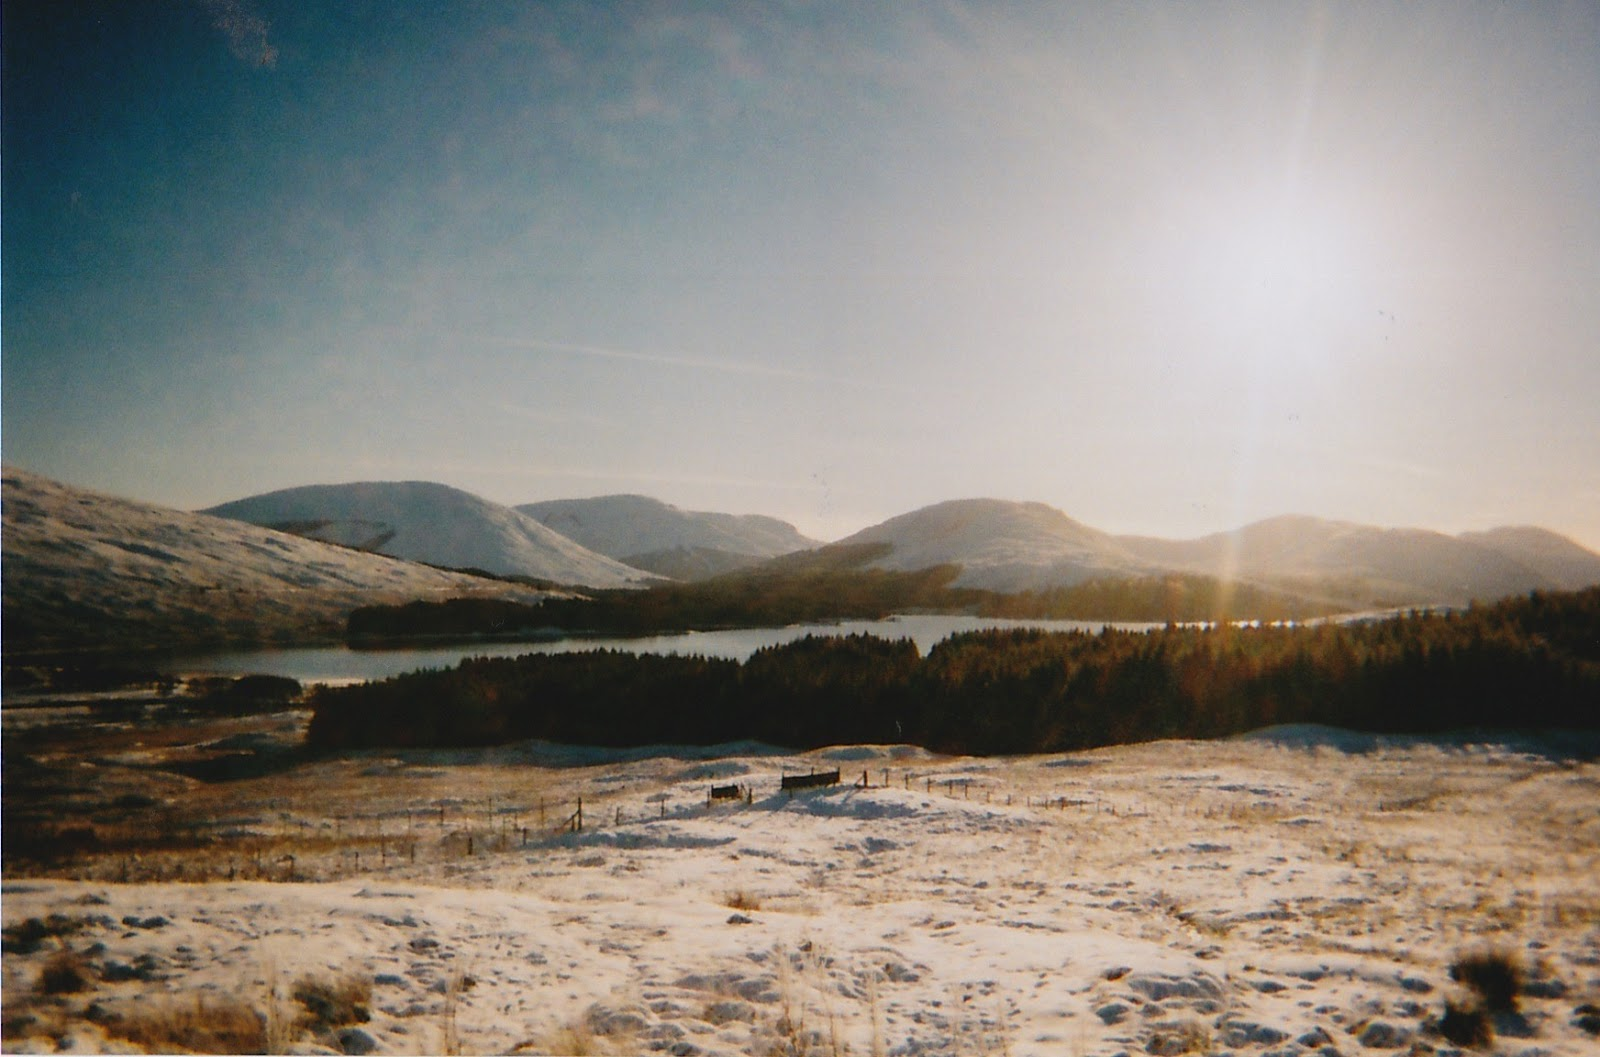 scotland 35mm film